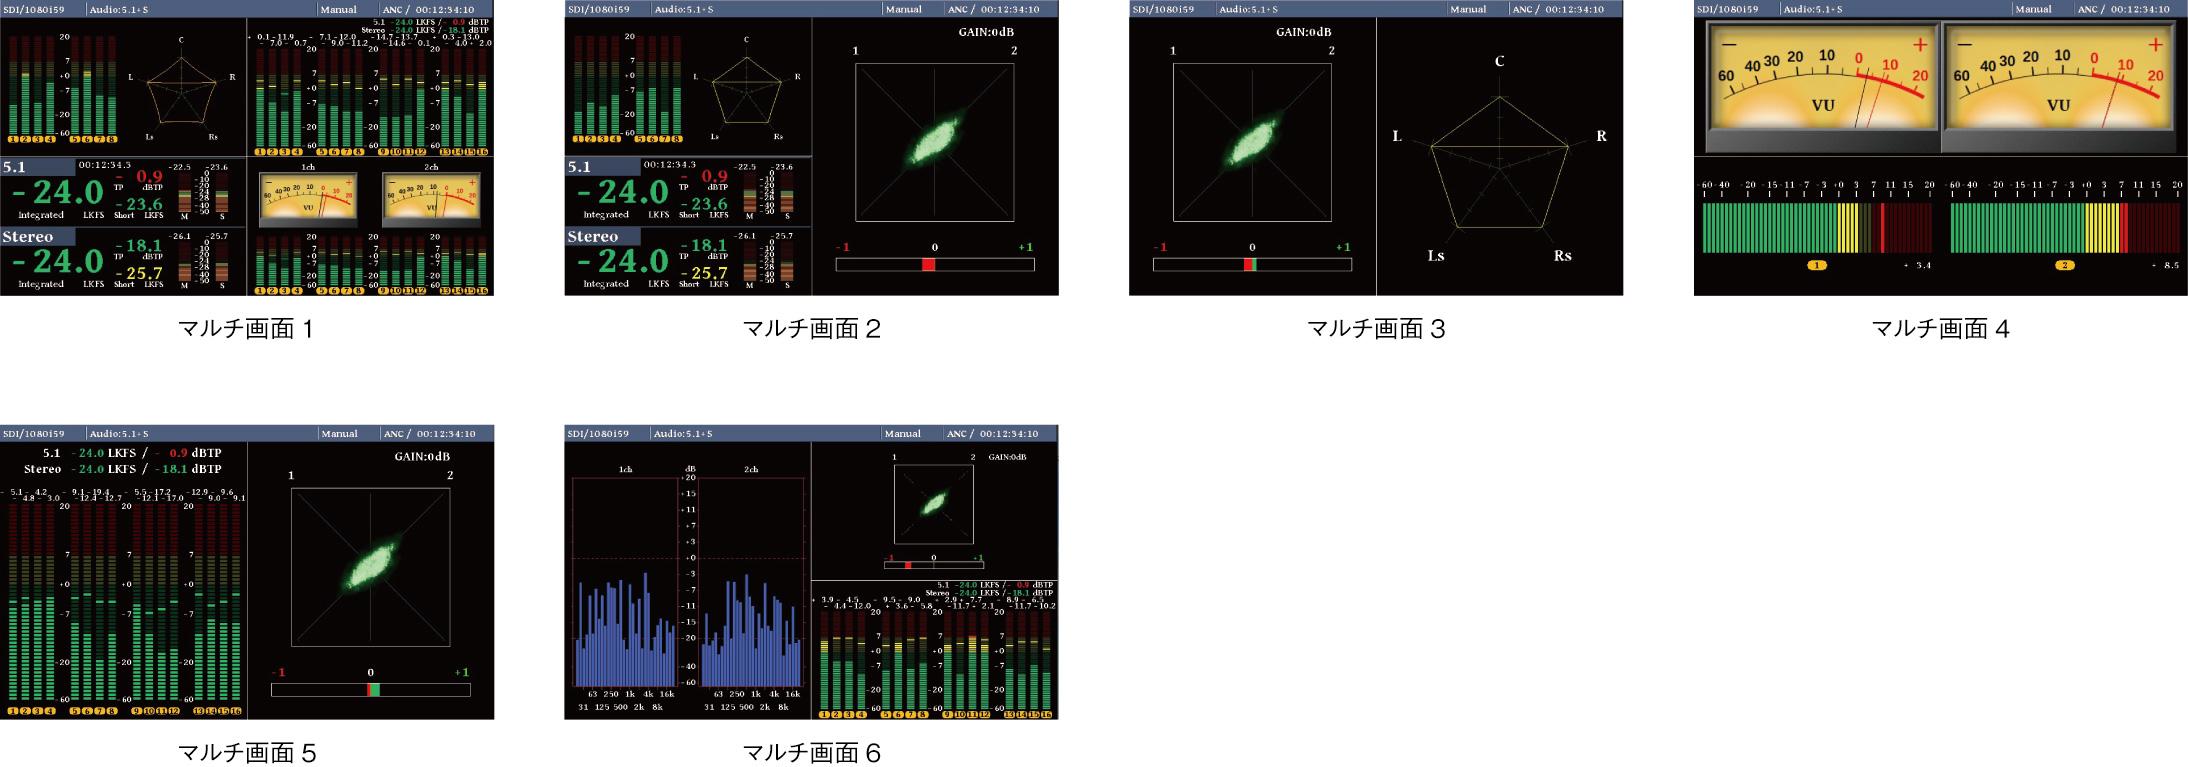 LjM3a-12G_LCD2